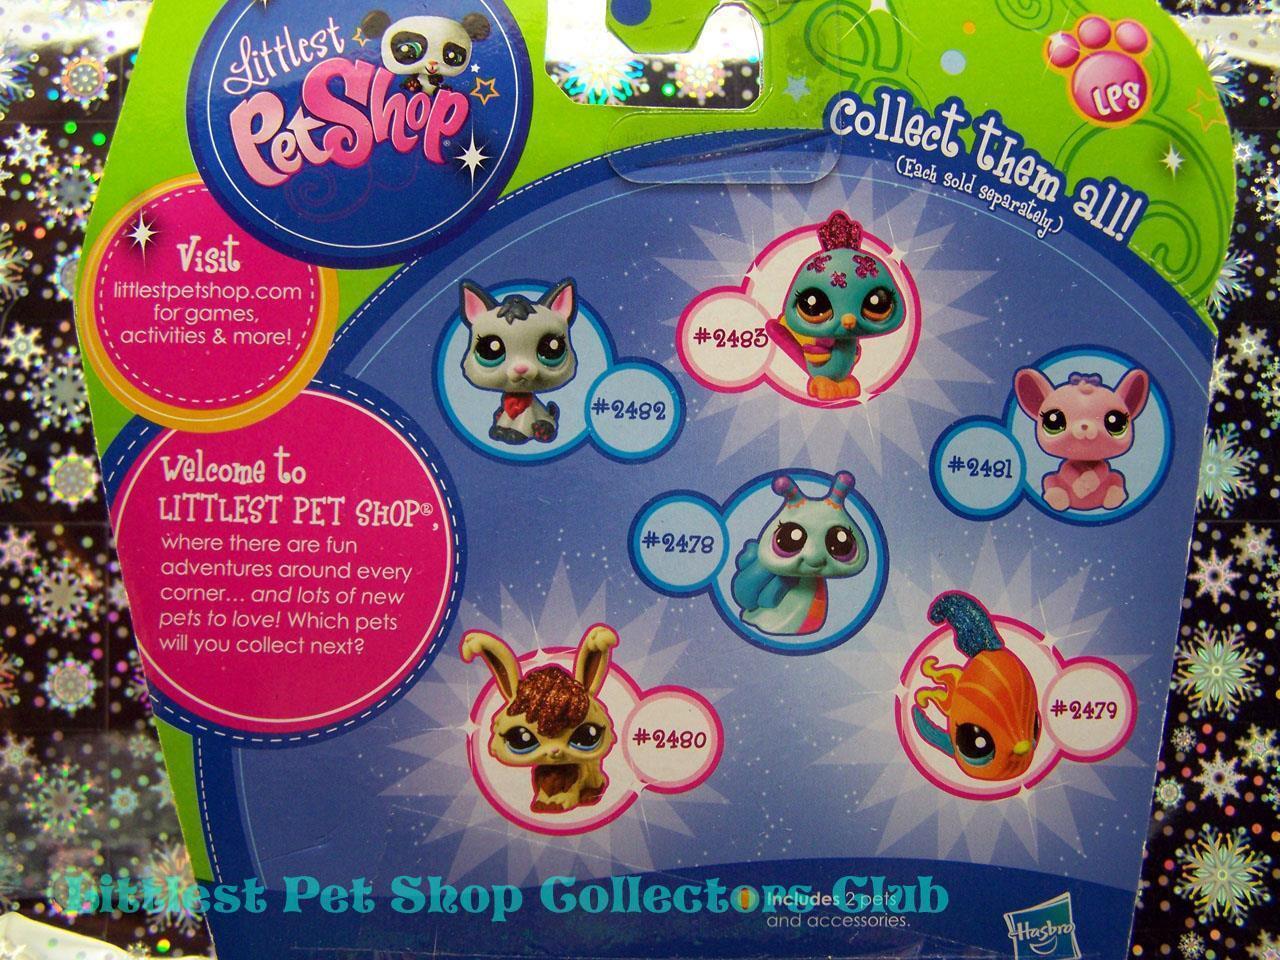 Littlest Pet Shop Walmart Glitter BUNNY lot MOUSE 2481 2481 2481 Rare Retired NIB f97d32